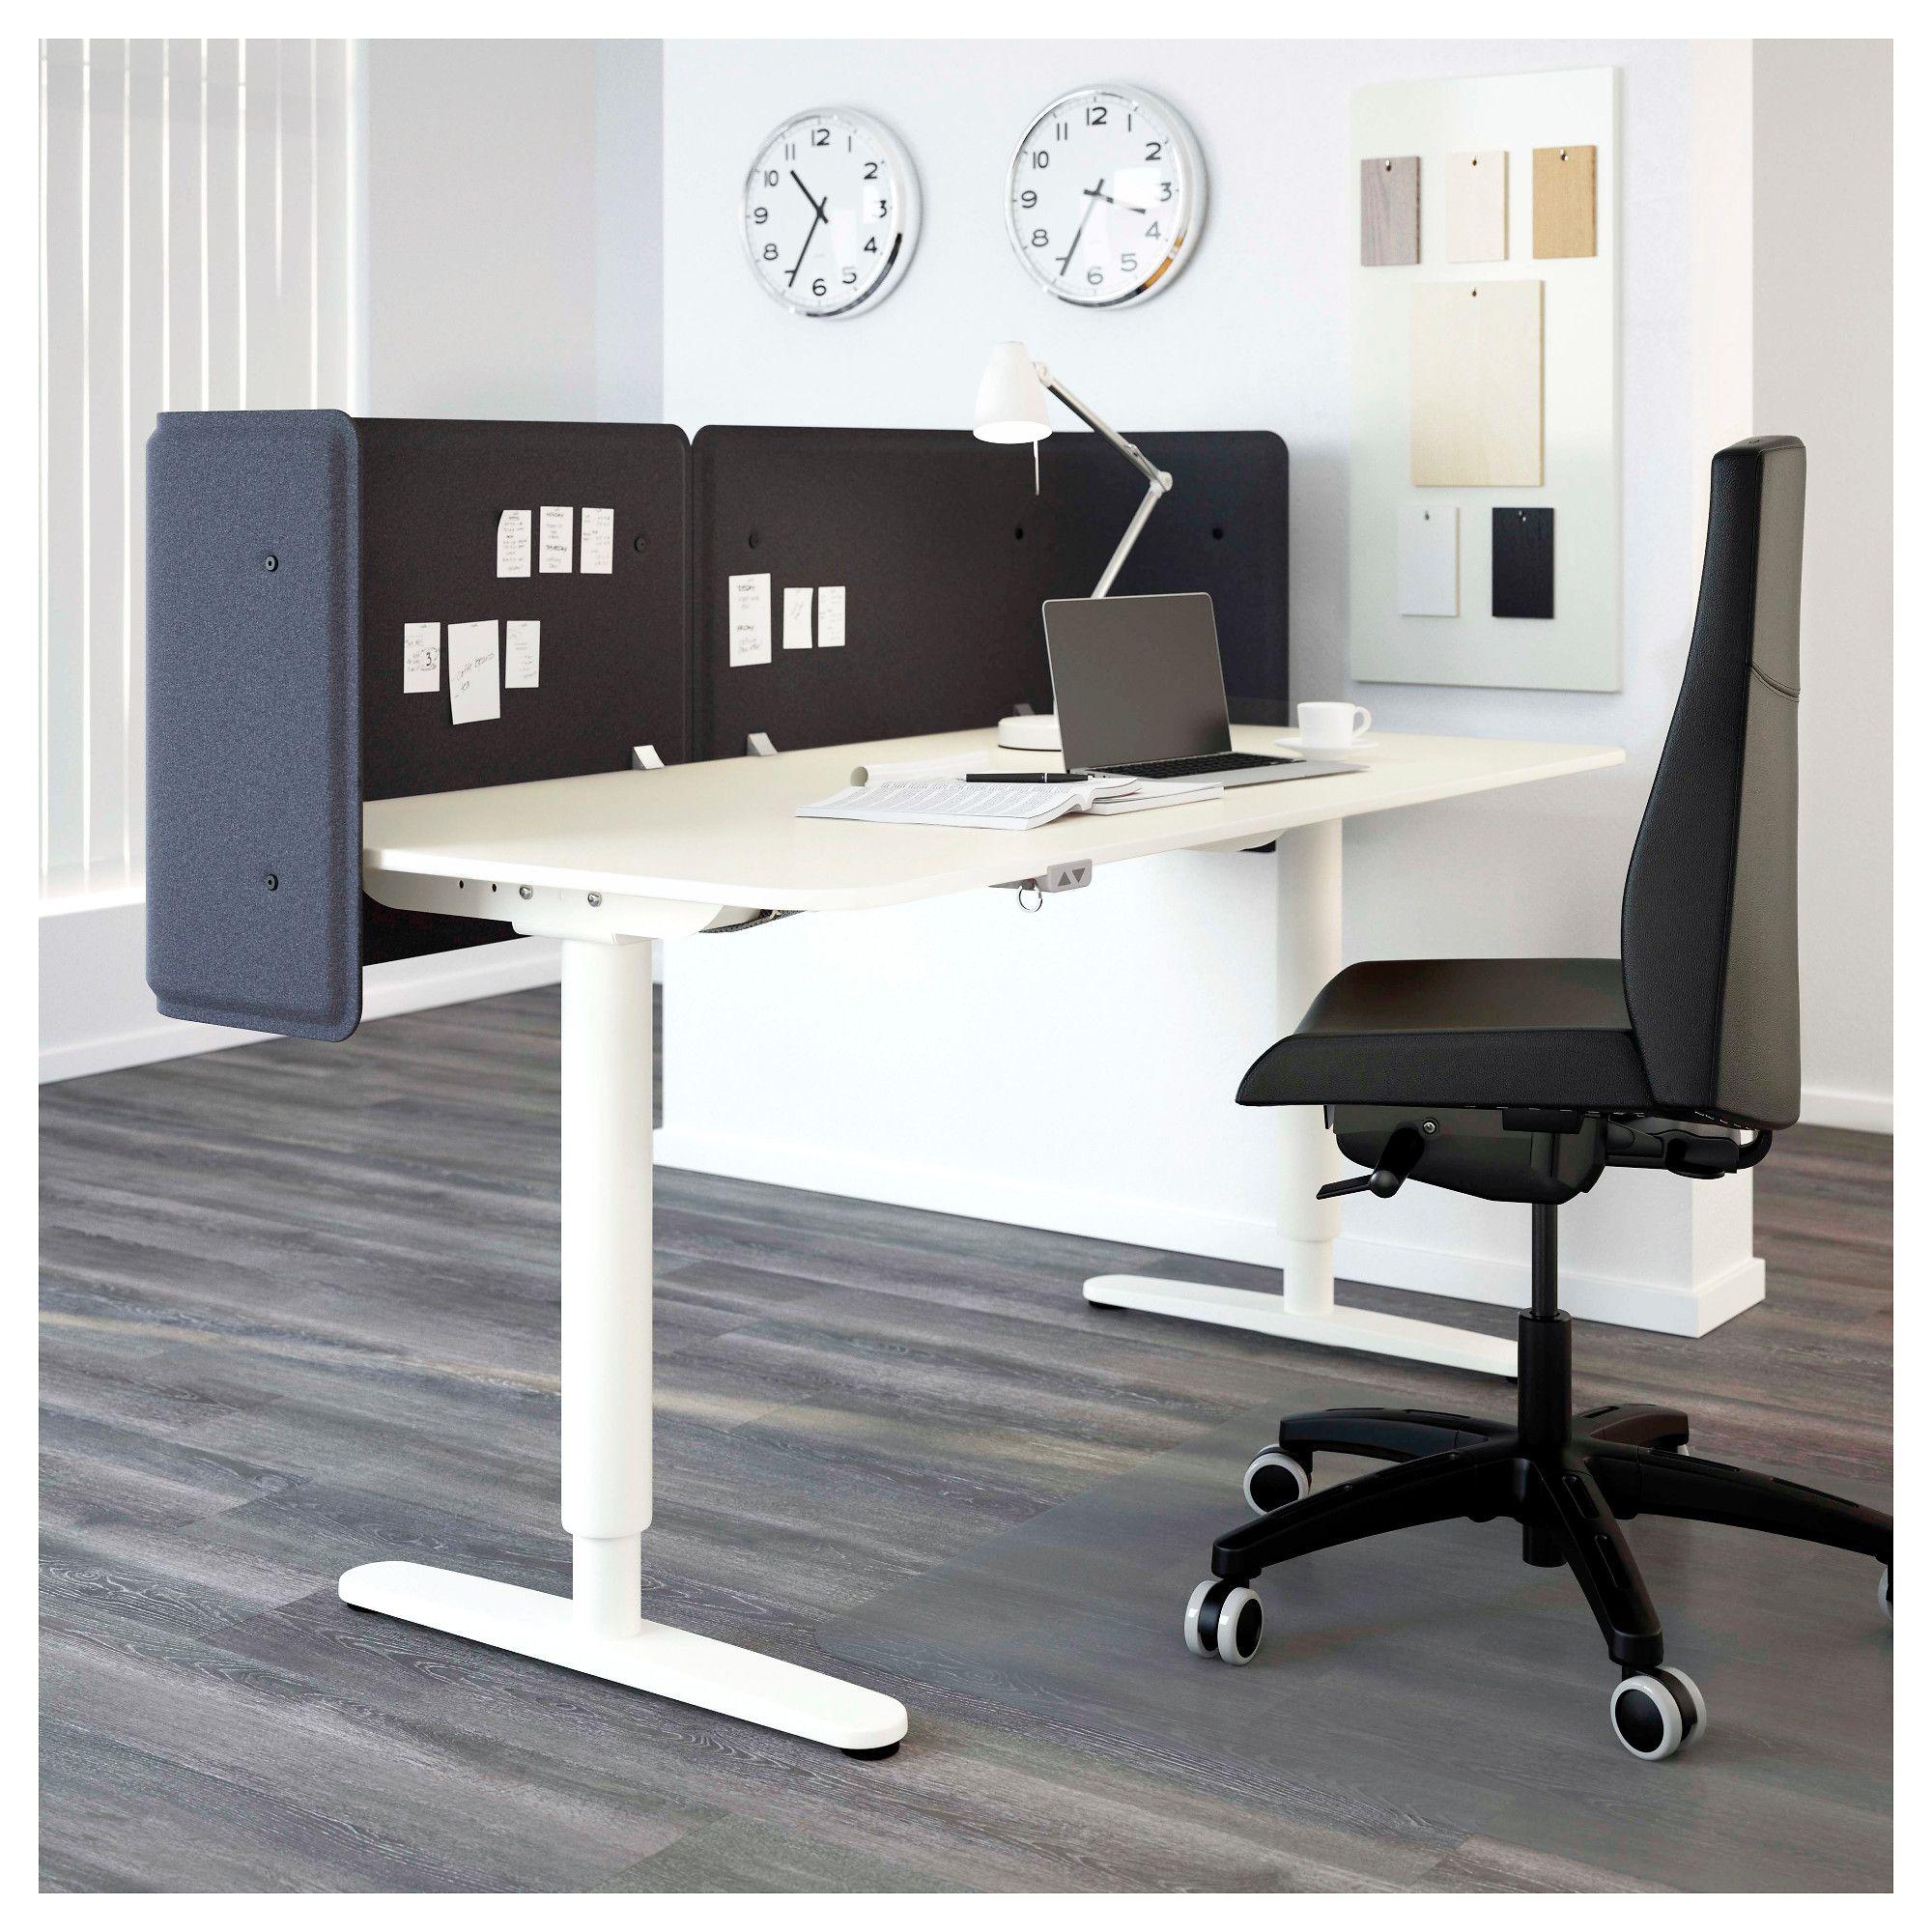 ikea bekant reception desk sit stand white cafe ikea desk rh pinterest com